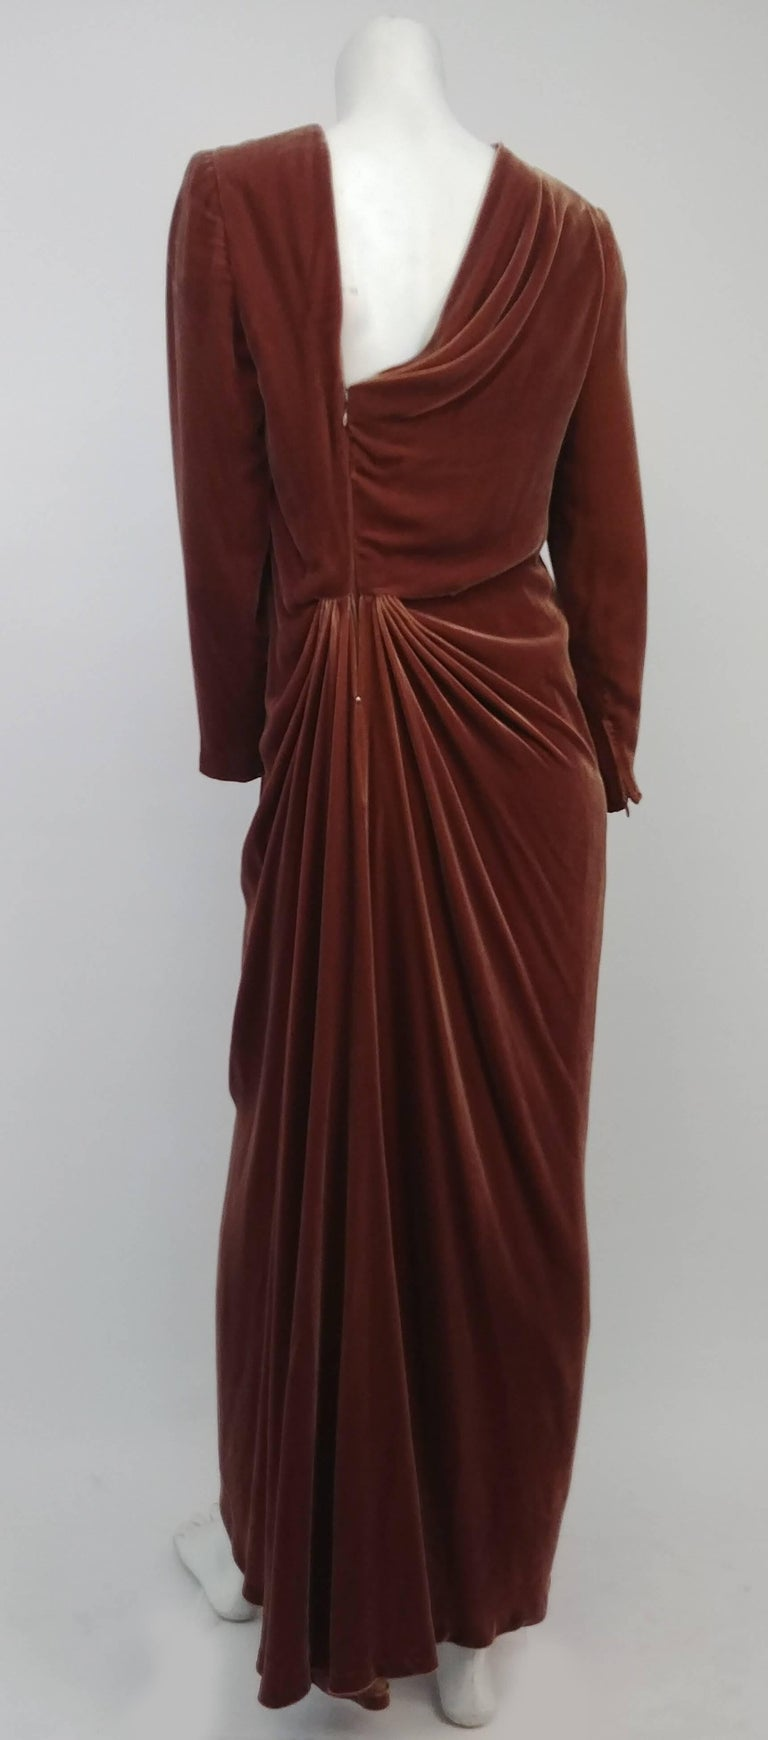 80s Oscar de la Renta Cognac Velvet Draped Evening Dress In Excellent Condition For Sale In San Francisco, CA